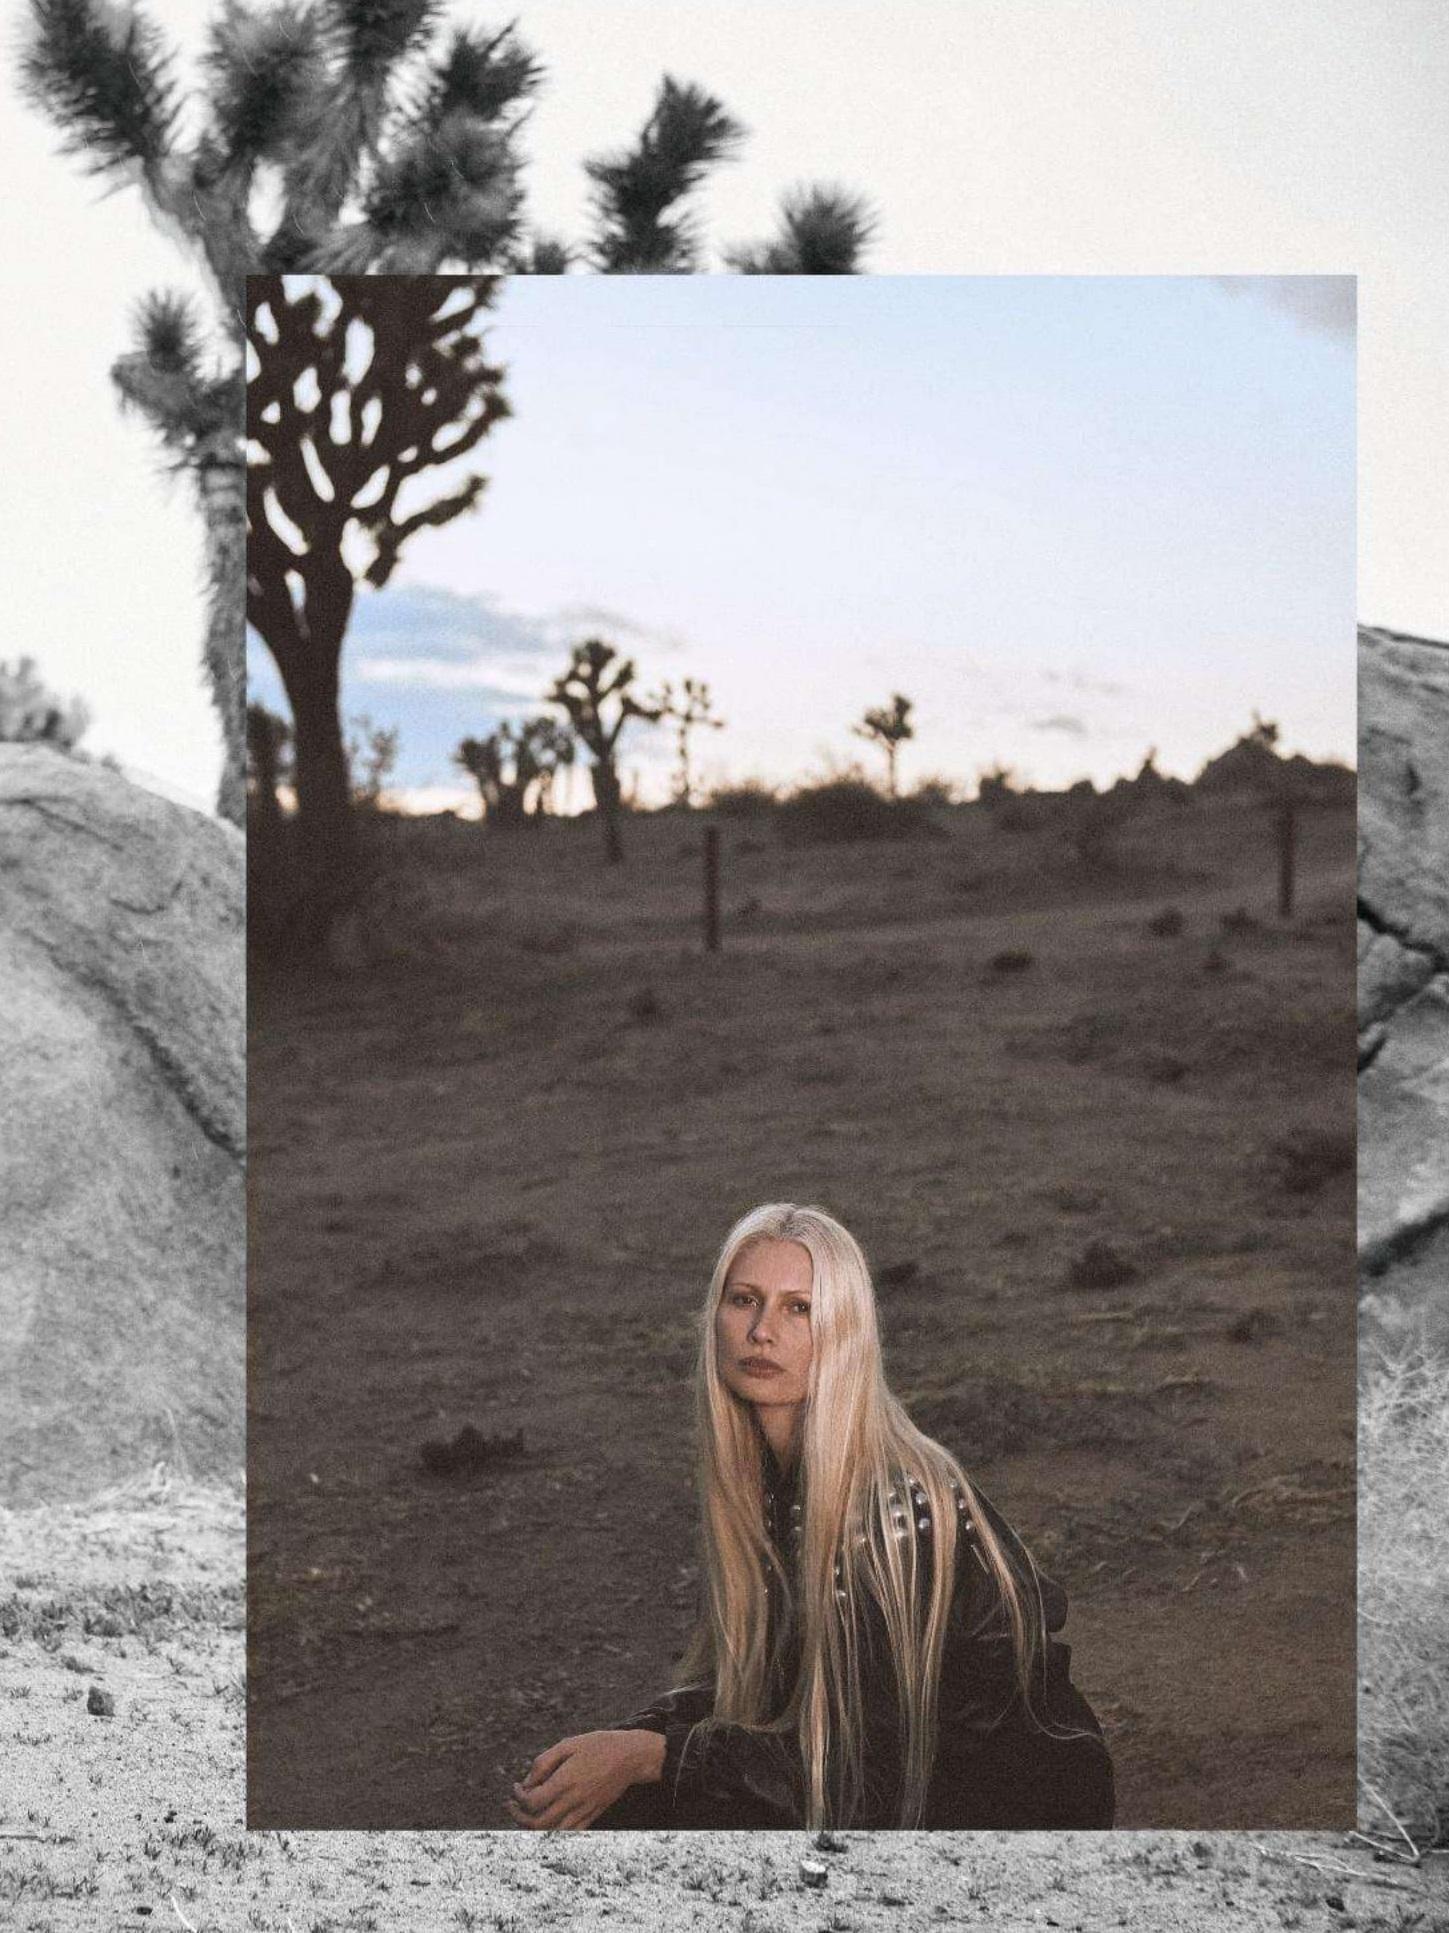 Kirsty-Hume-Regan-Cameron-Harpers-Bazaar-Germany-April-2019- (10).jpg